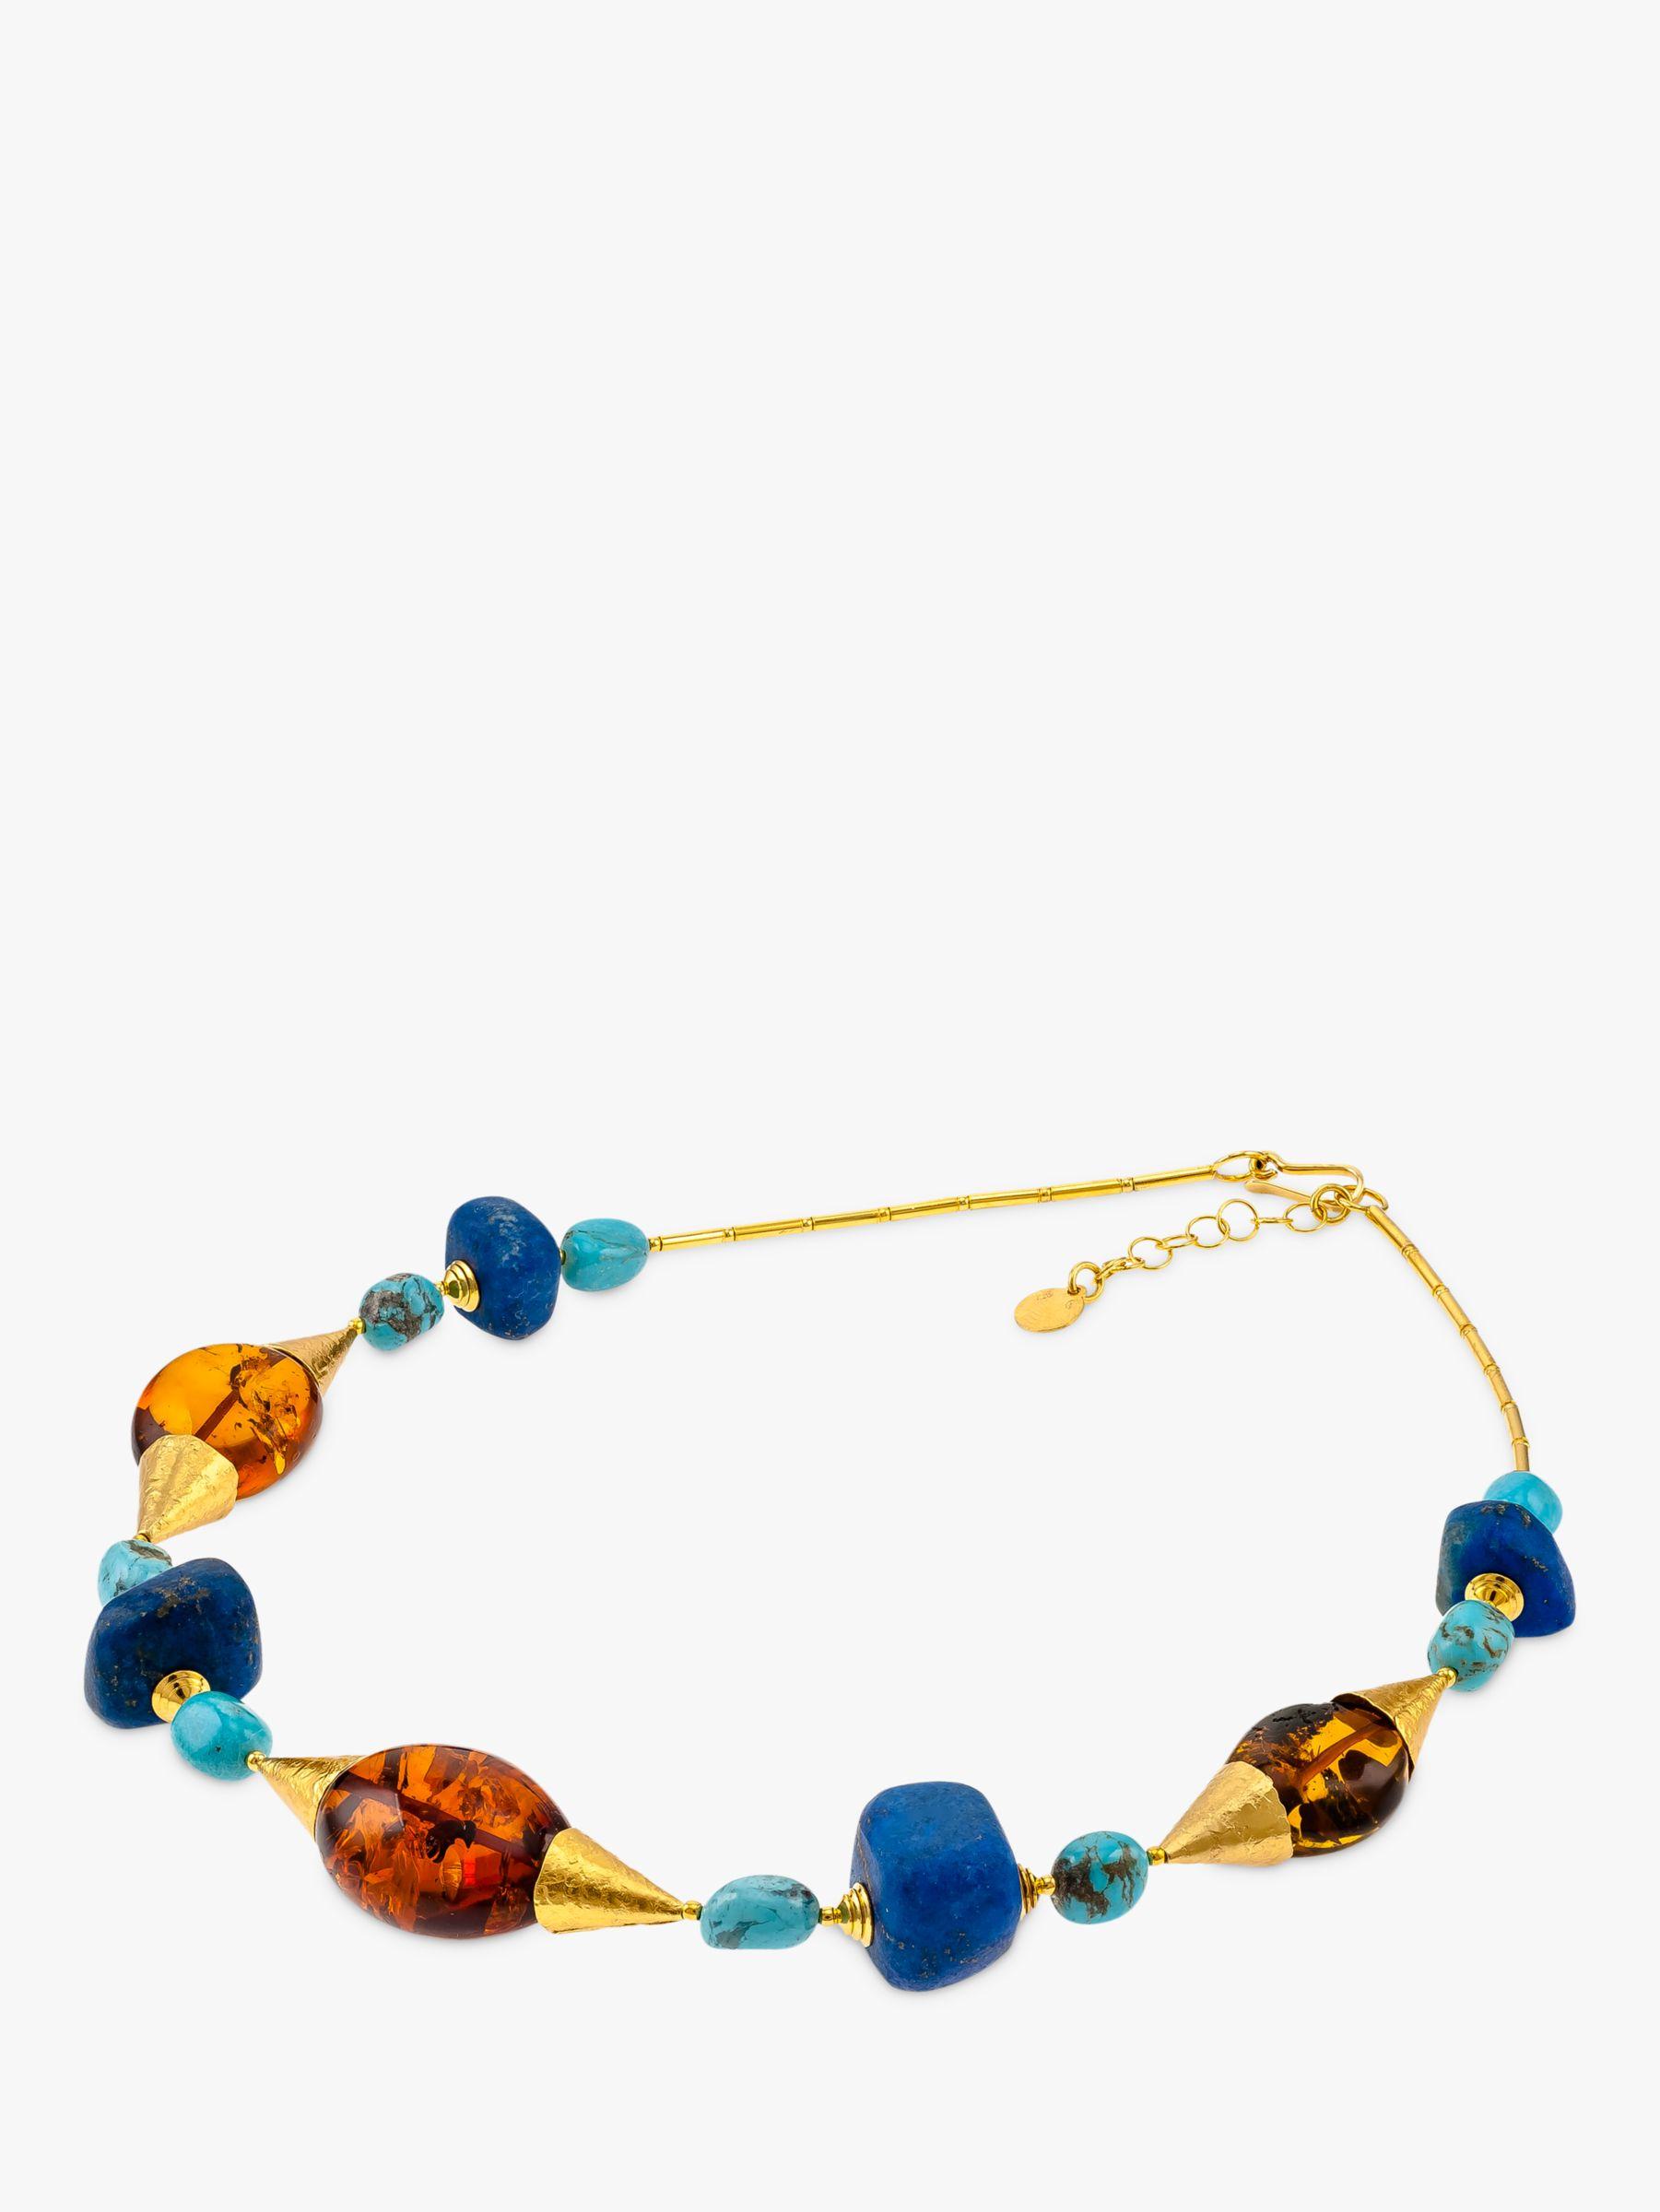 Be-Jewelled Be-Jewelled Venezia Statement Collar Necklace, Multi